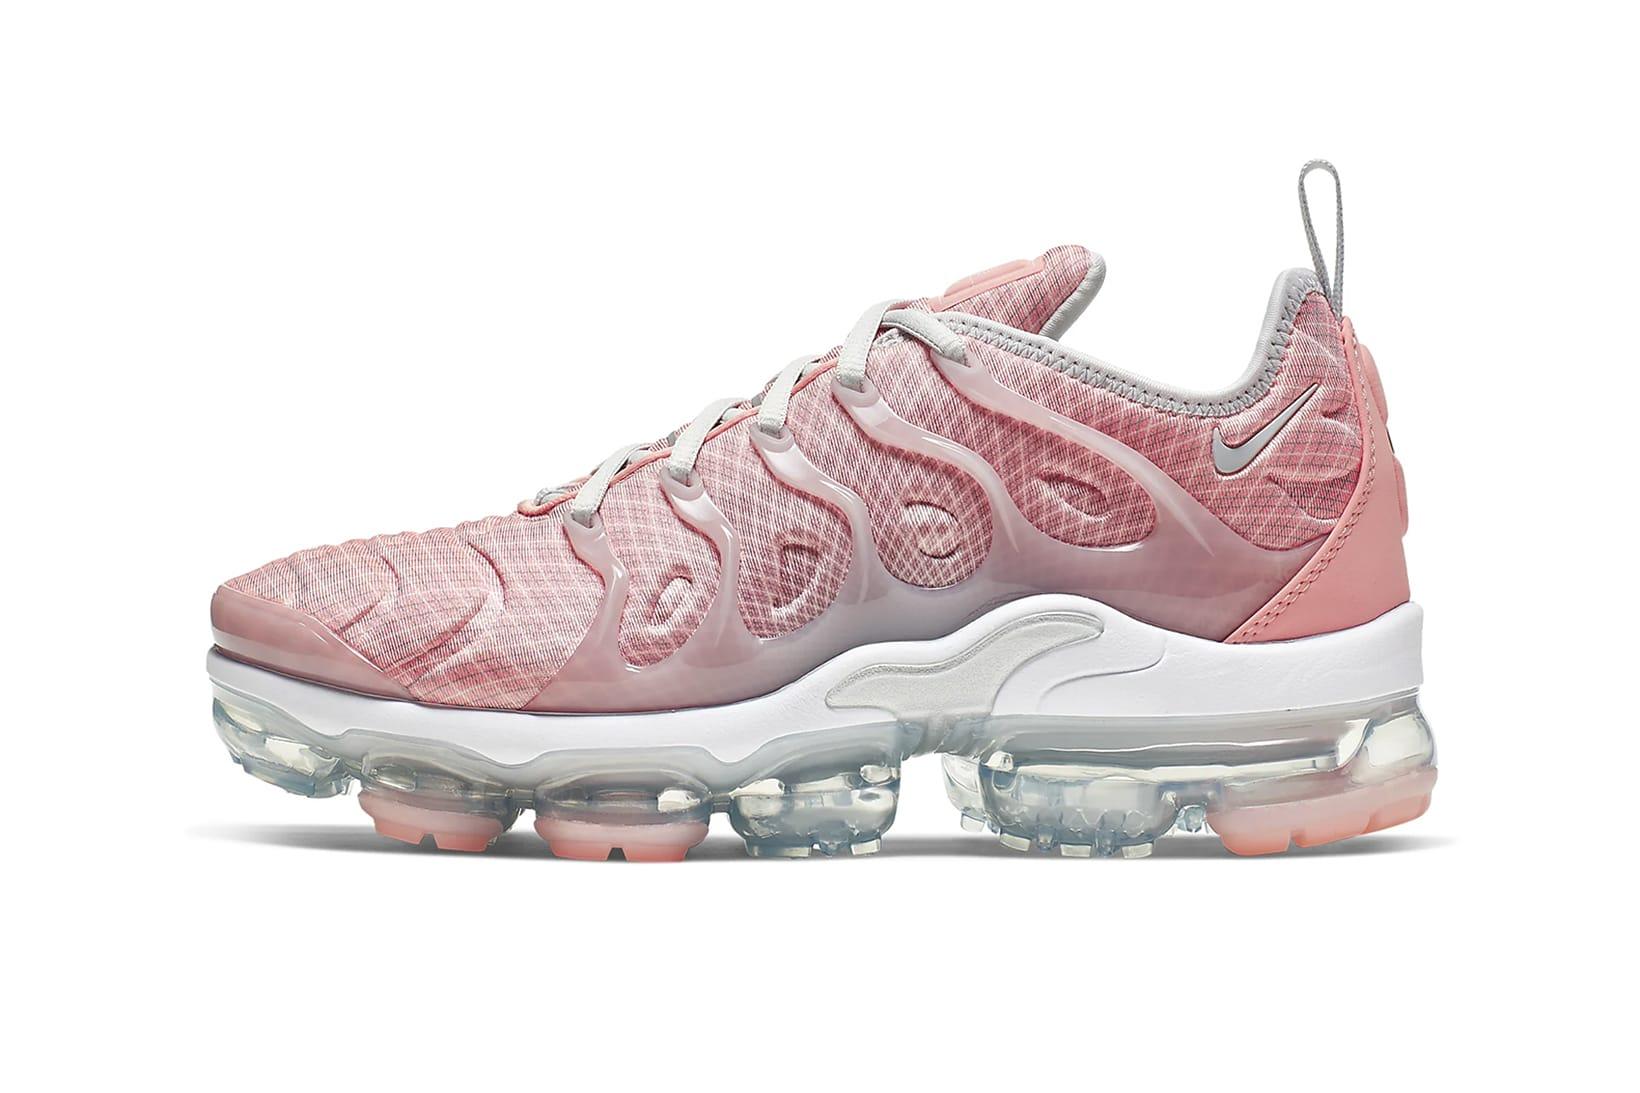 nike air vapormax womens pink